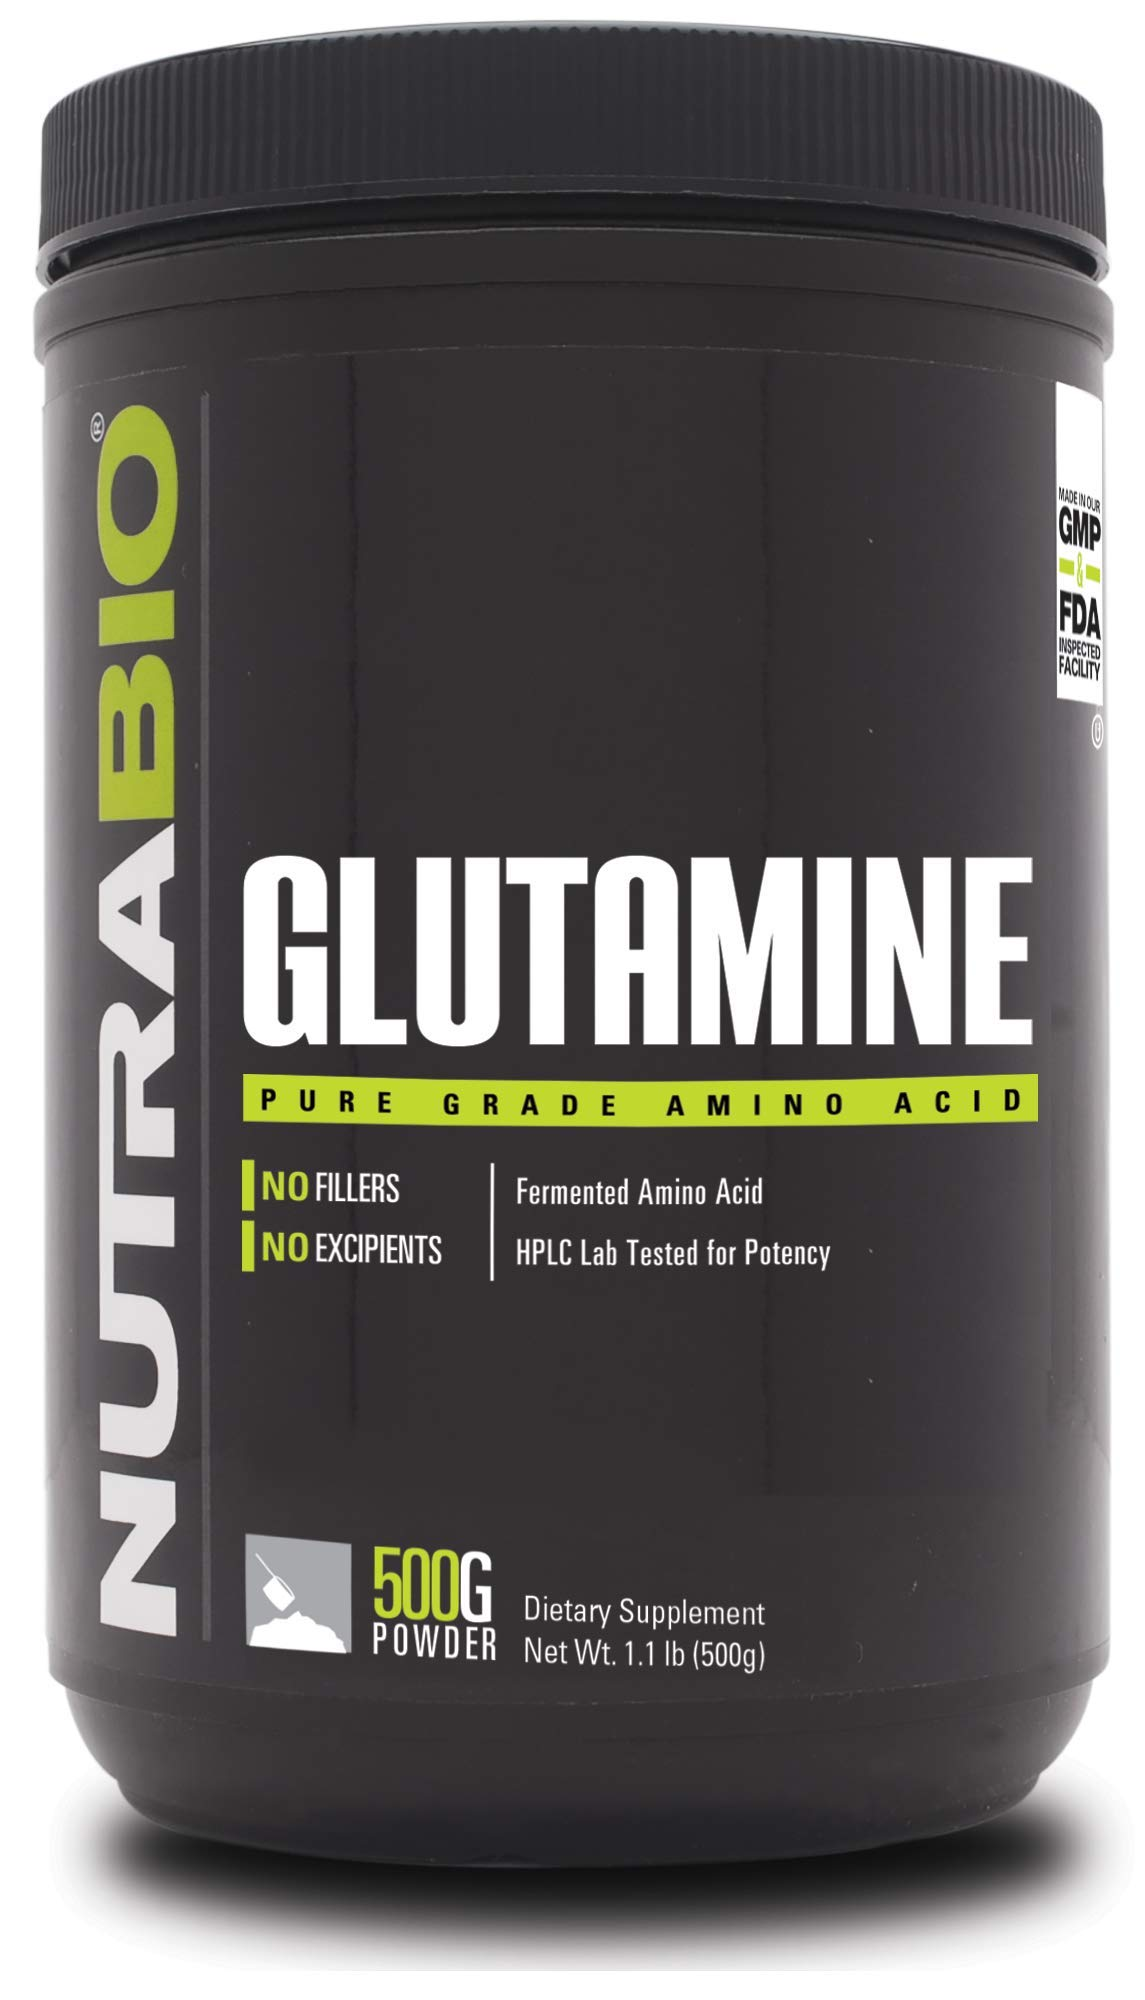 NutraBio L-Glutamine Powder - 500 Grams by NutraBio